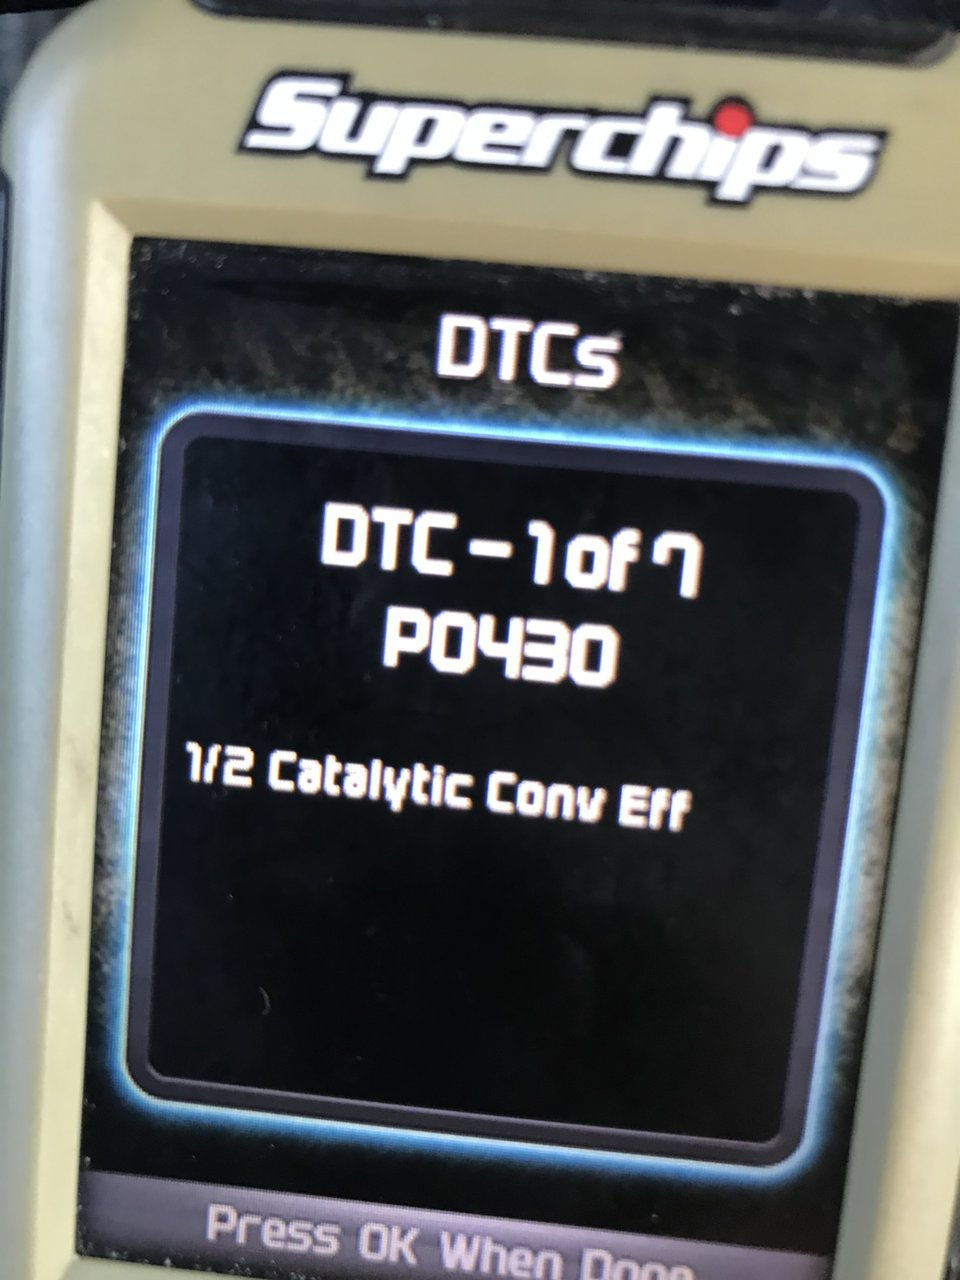 8110ABDE-3273-4C66-B539-9C61DC8B1700.jpg